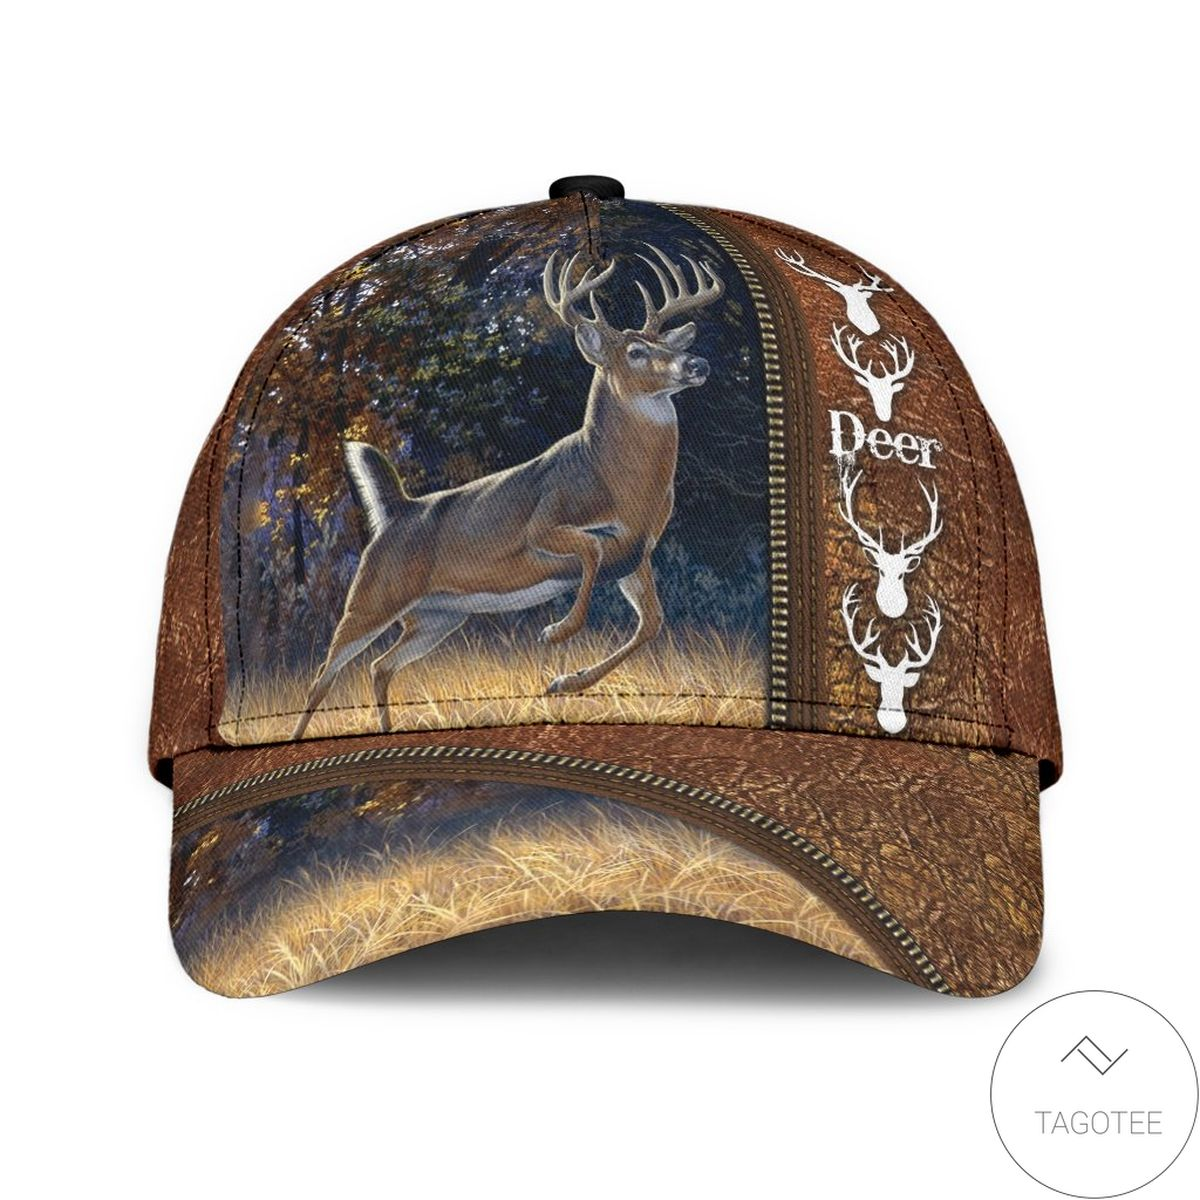 Perfect Deer Leather Classic Cap